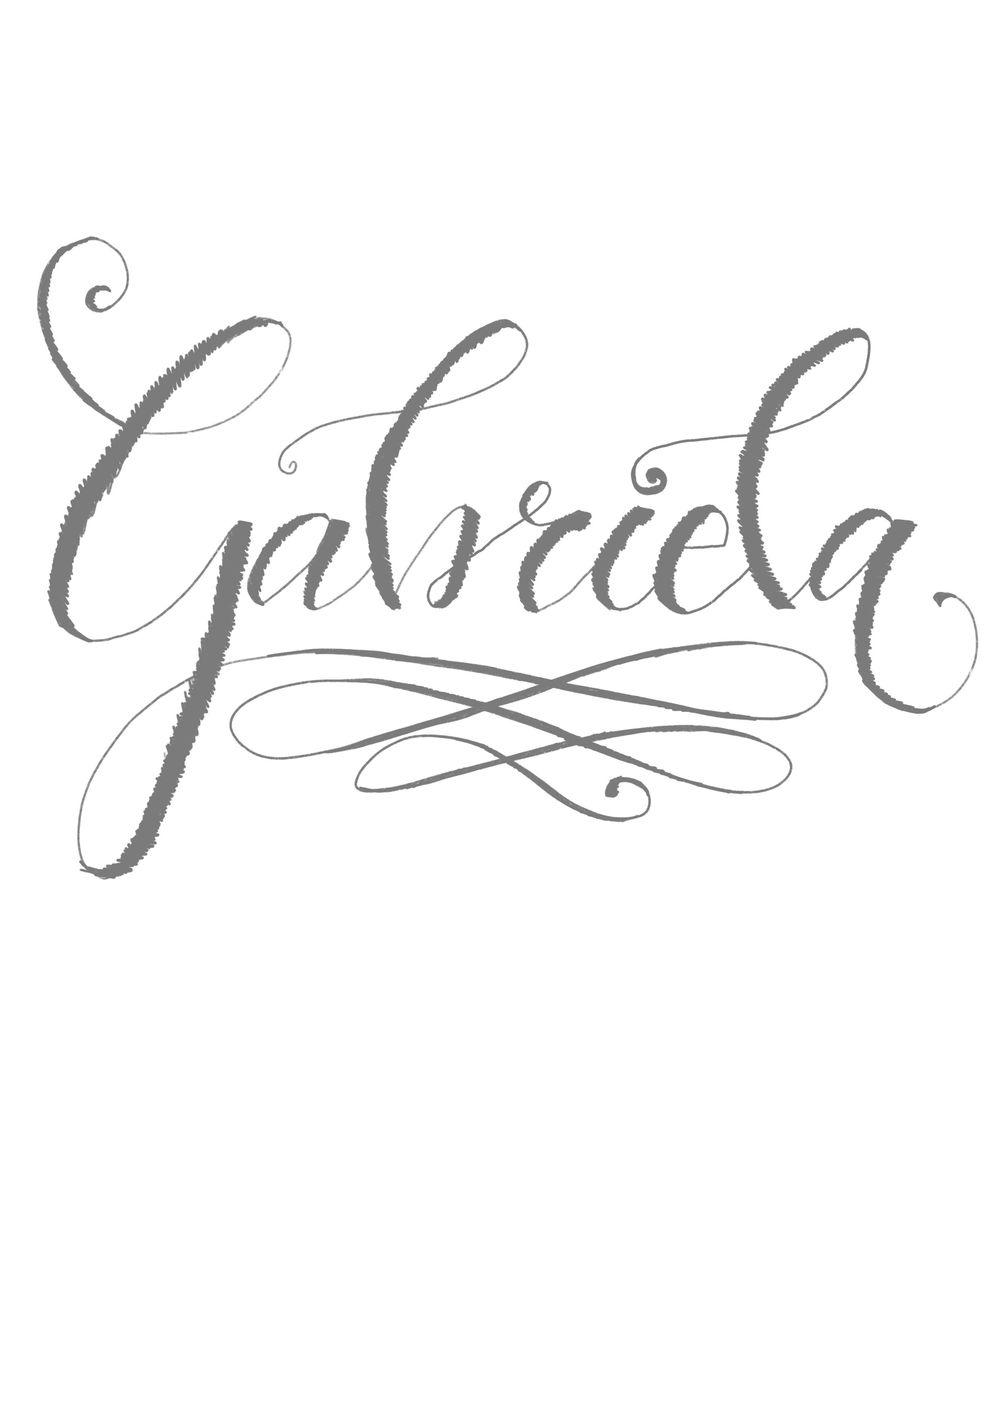 Gabriela - image 4 - student project